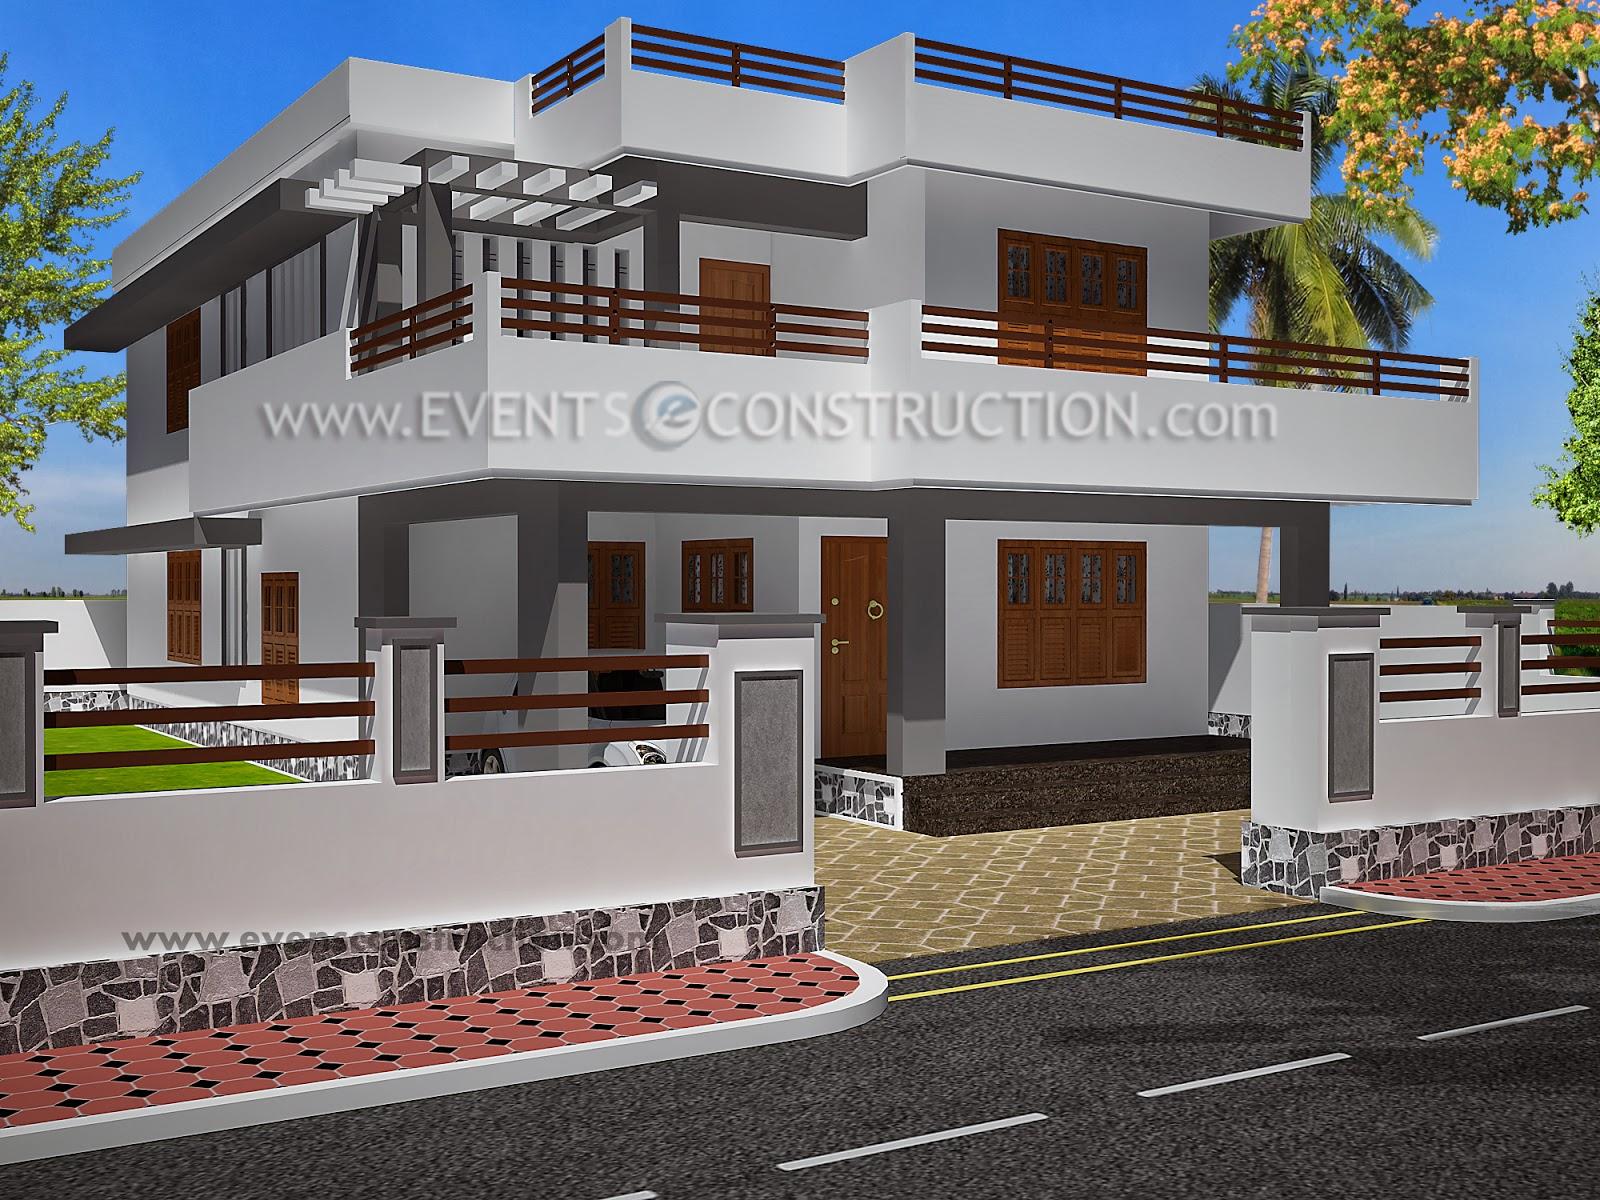 House Compound Wall Design | Joy Studio Design Gallery ...